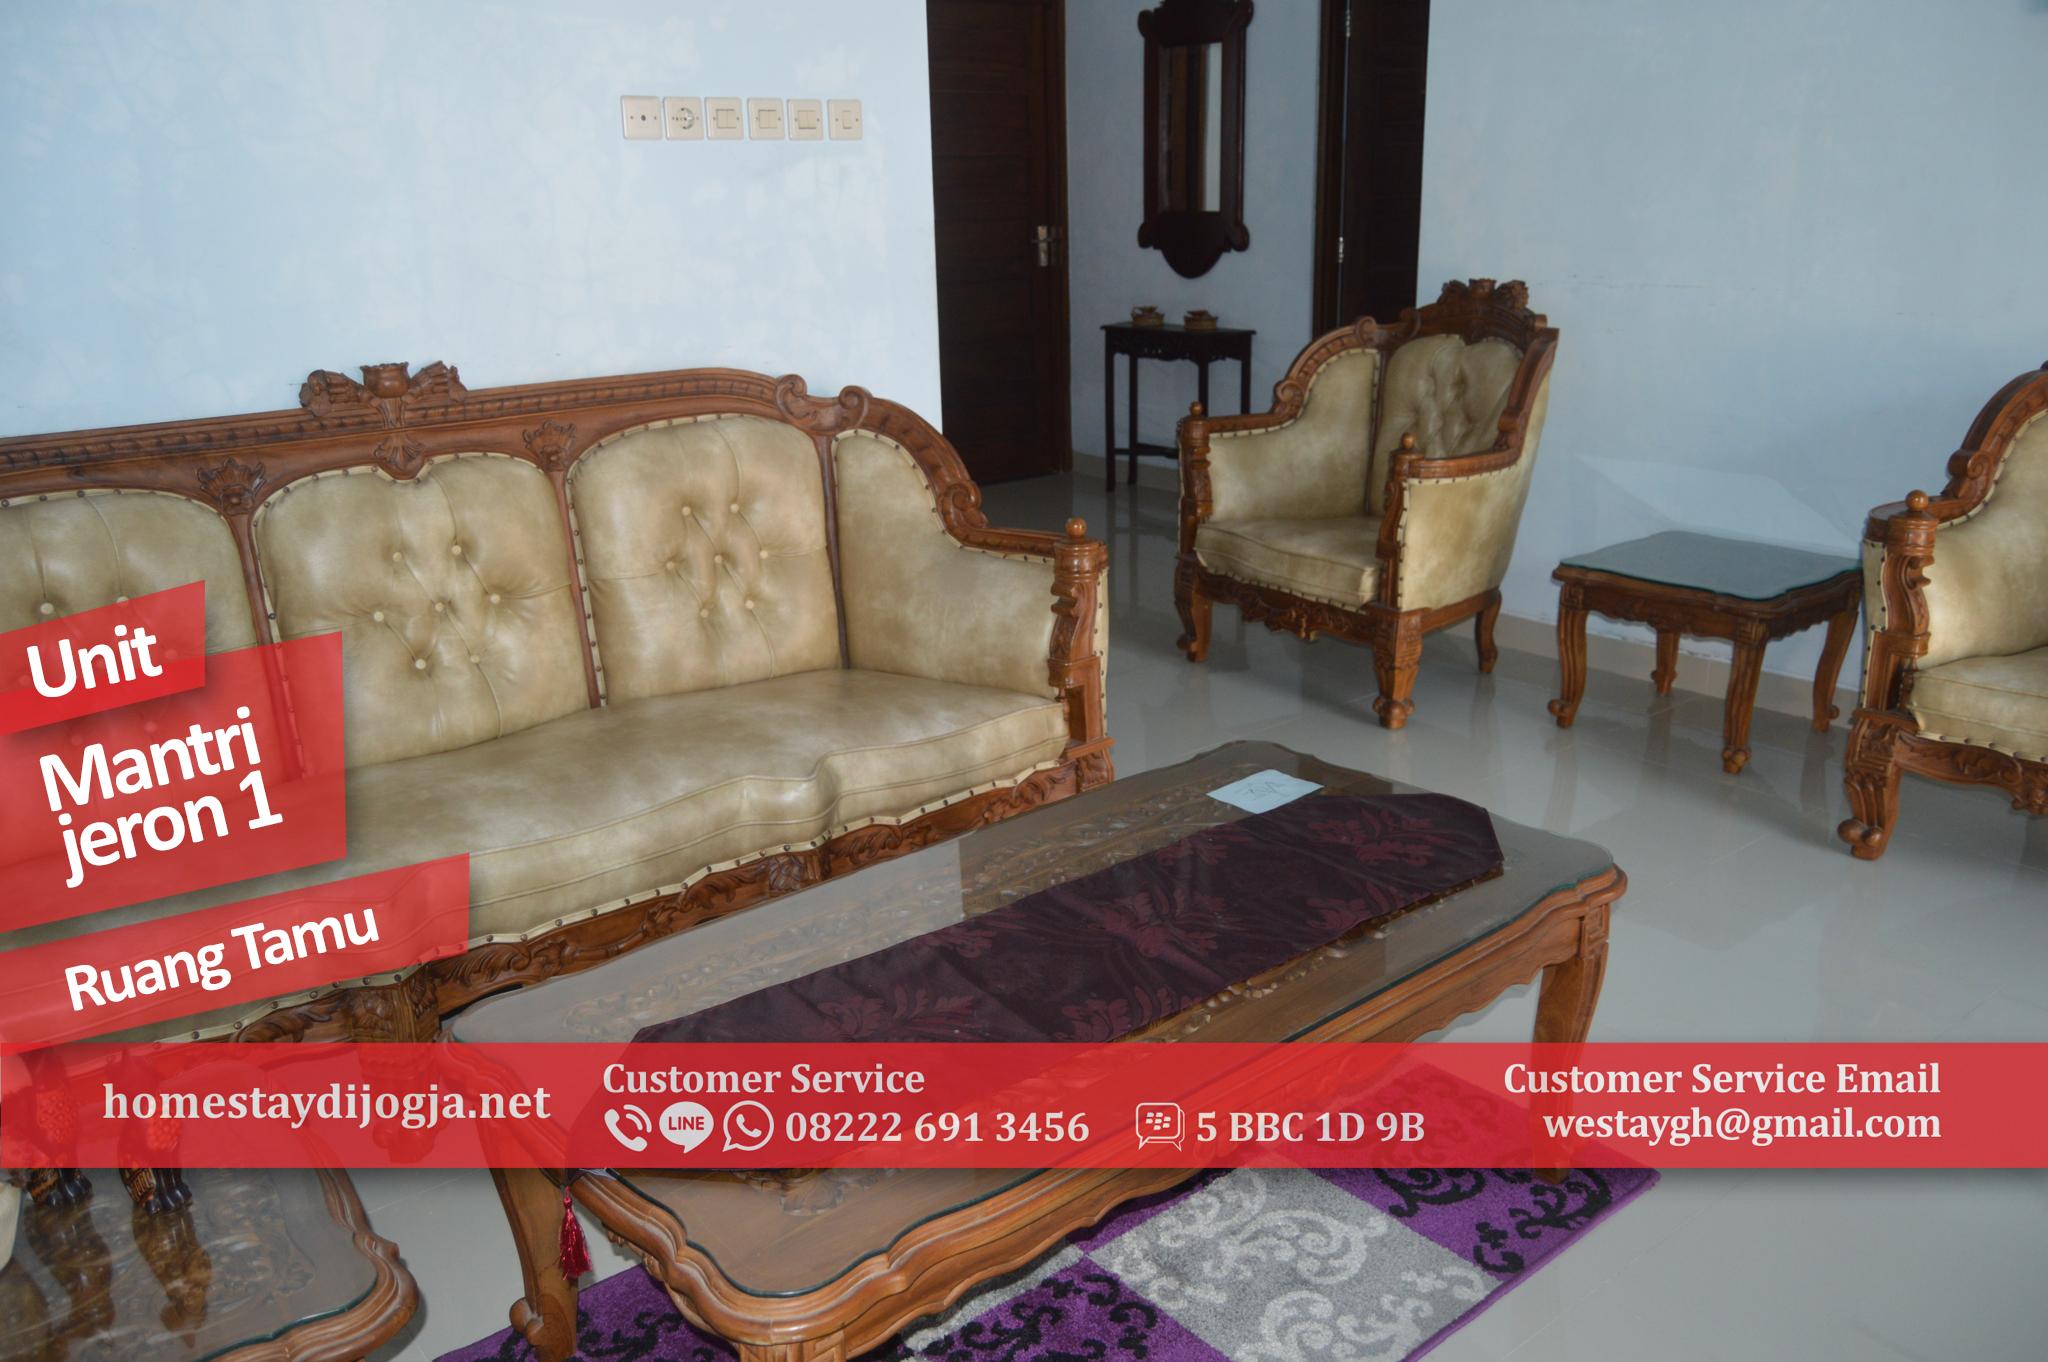 Guest House Jogja 3 kamar tidur + TV di Mantrijeron 5 menit ke alun alun kidul